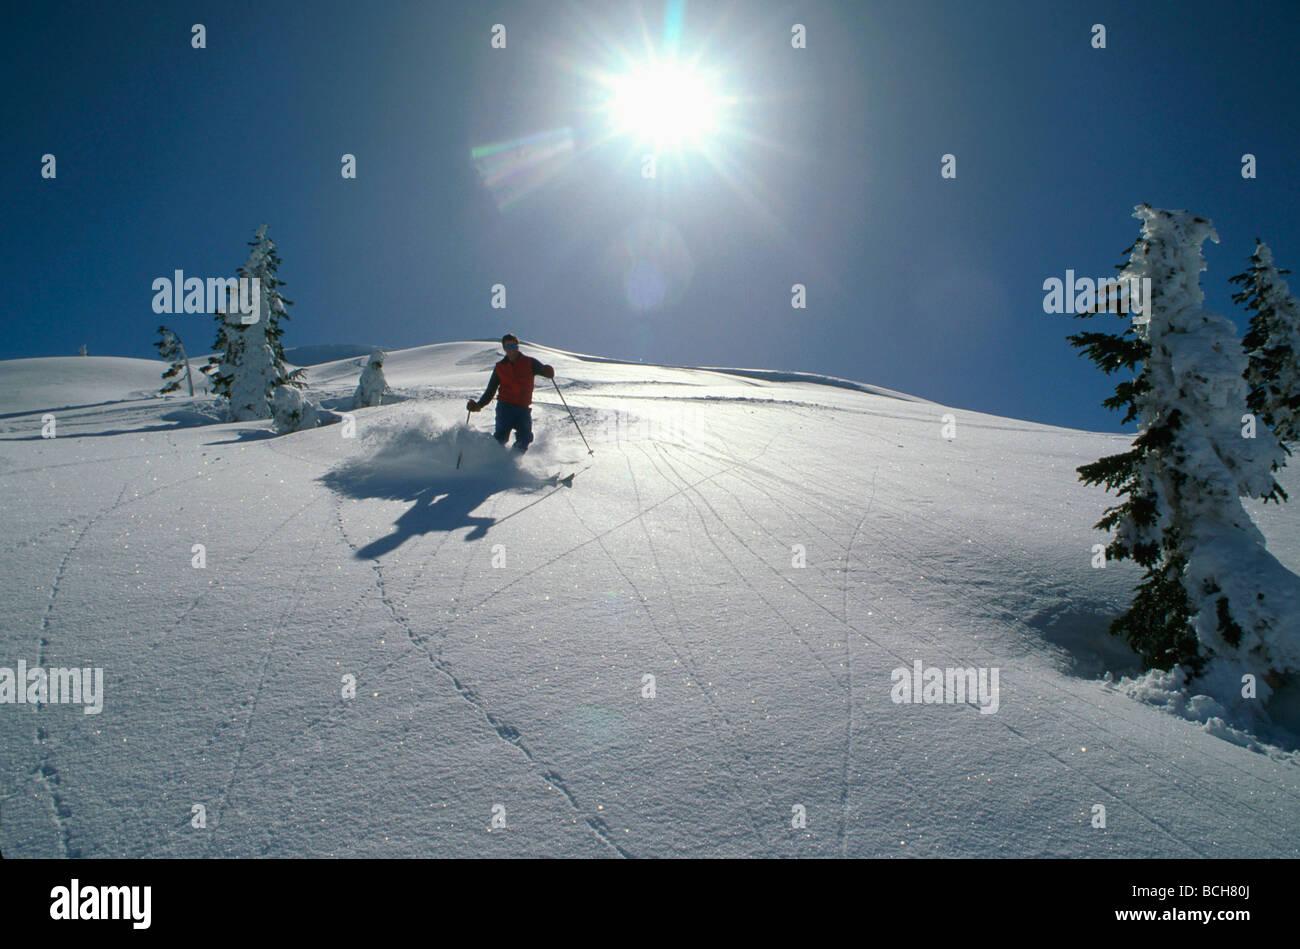 man downhill skiing southeast ak at ski resort juneau coast mtns